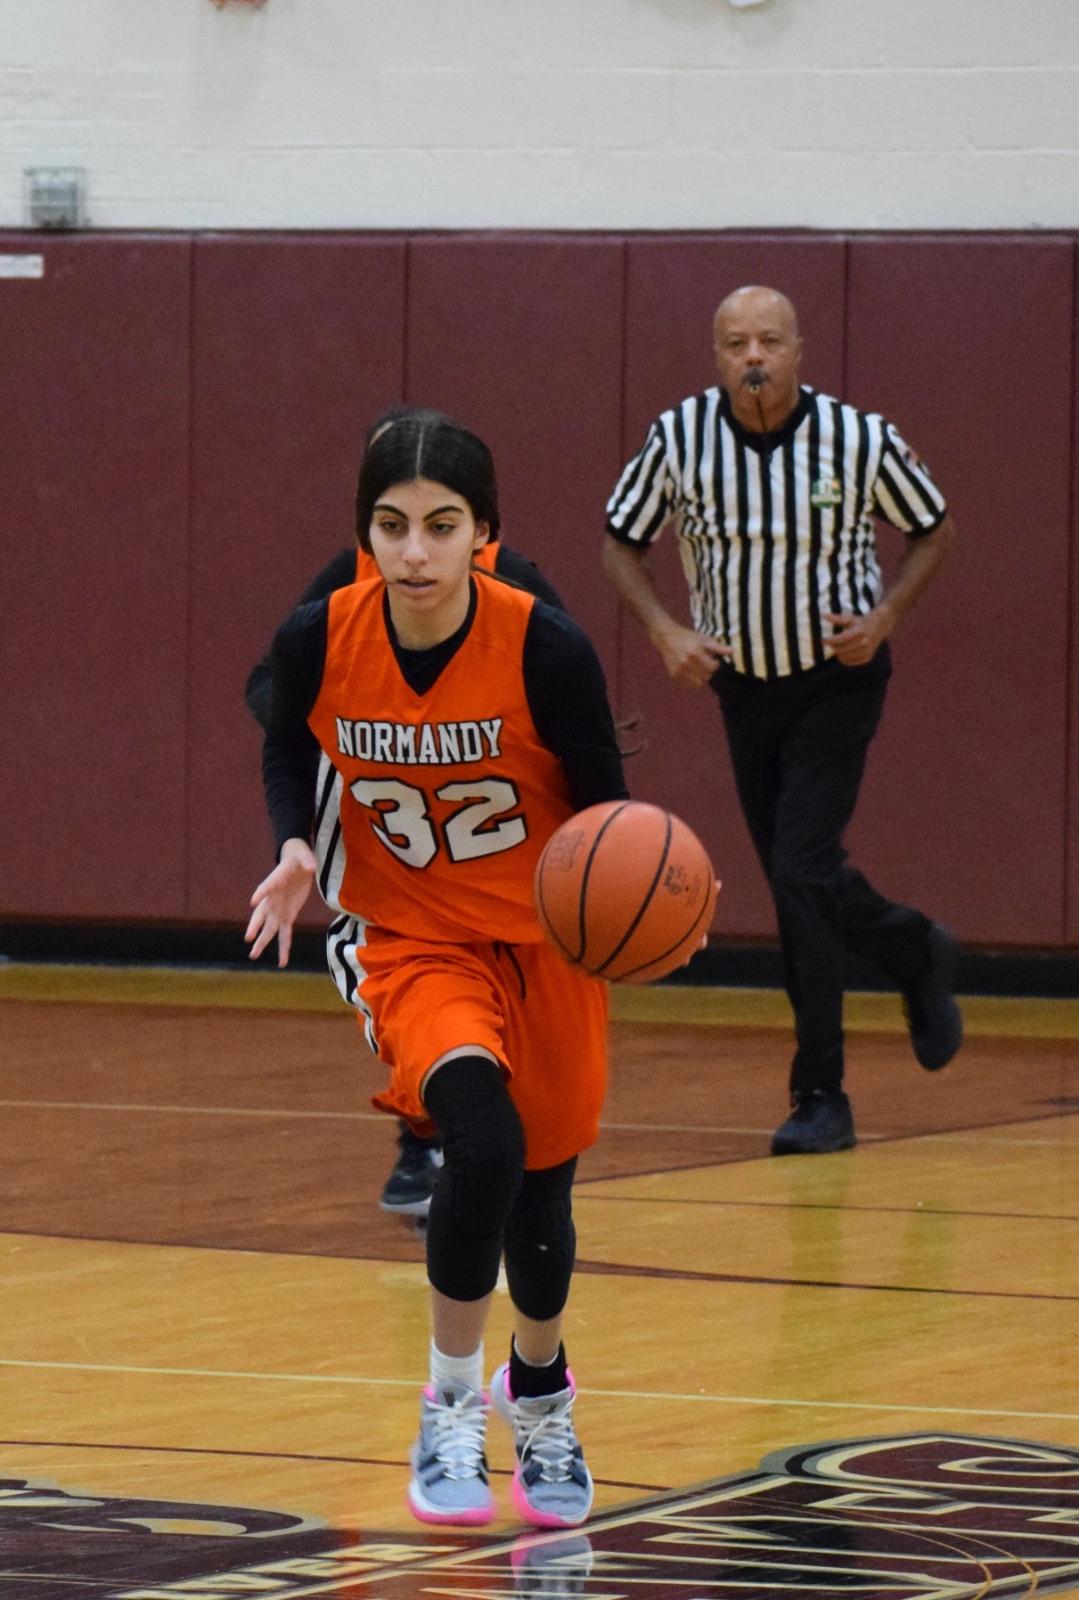 12/12/2020: JV Girls Basketball vs. Rocky River (Photo Credits: Dwayne Kessie)